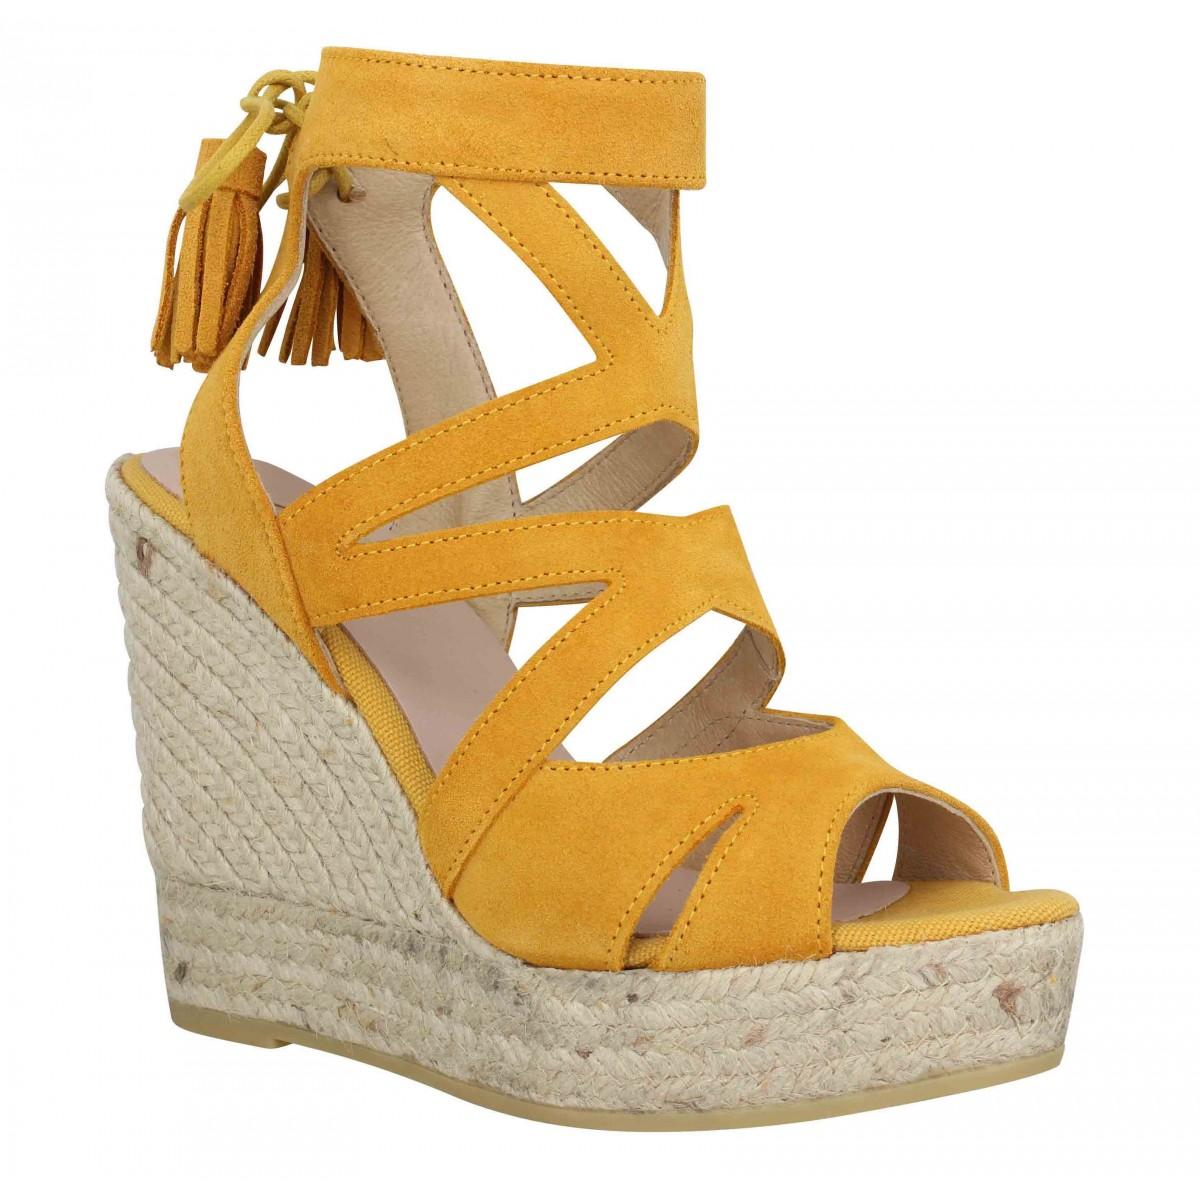 Sandales talons KANNA 6022 velours Femme Jaune